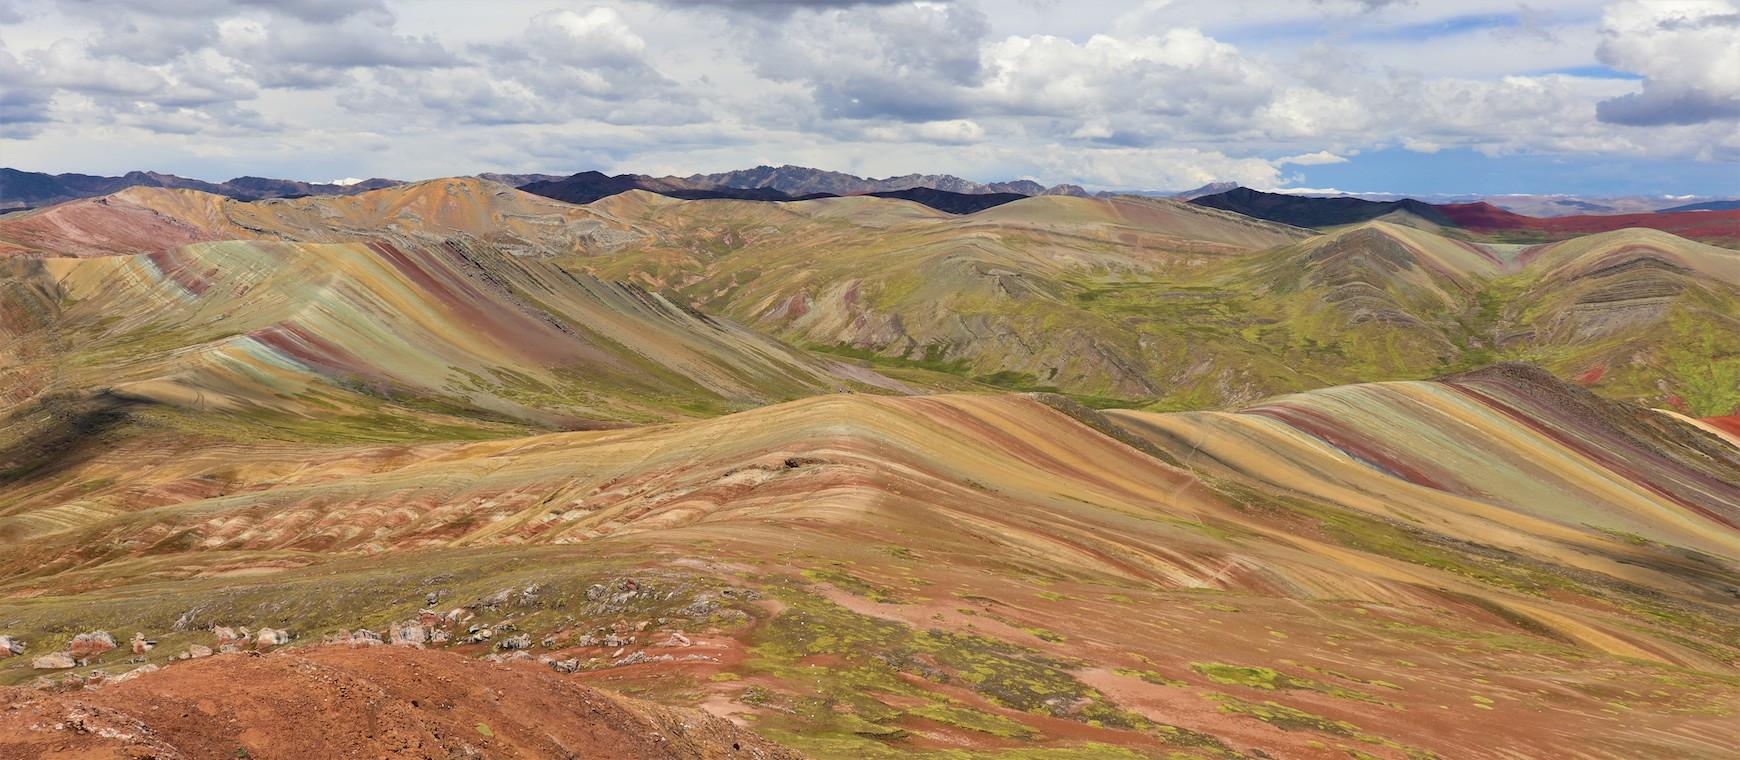 Palcoyo, l'autre cordillère arc-en-ciel de Cusco!